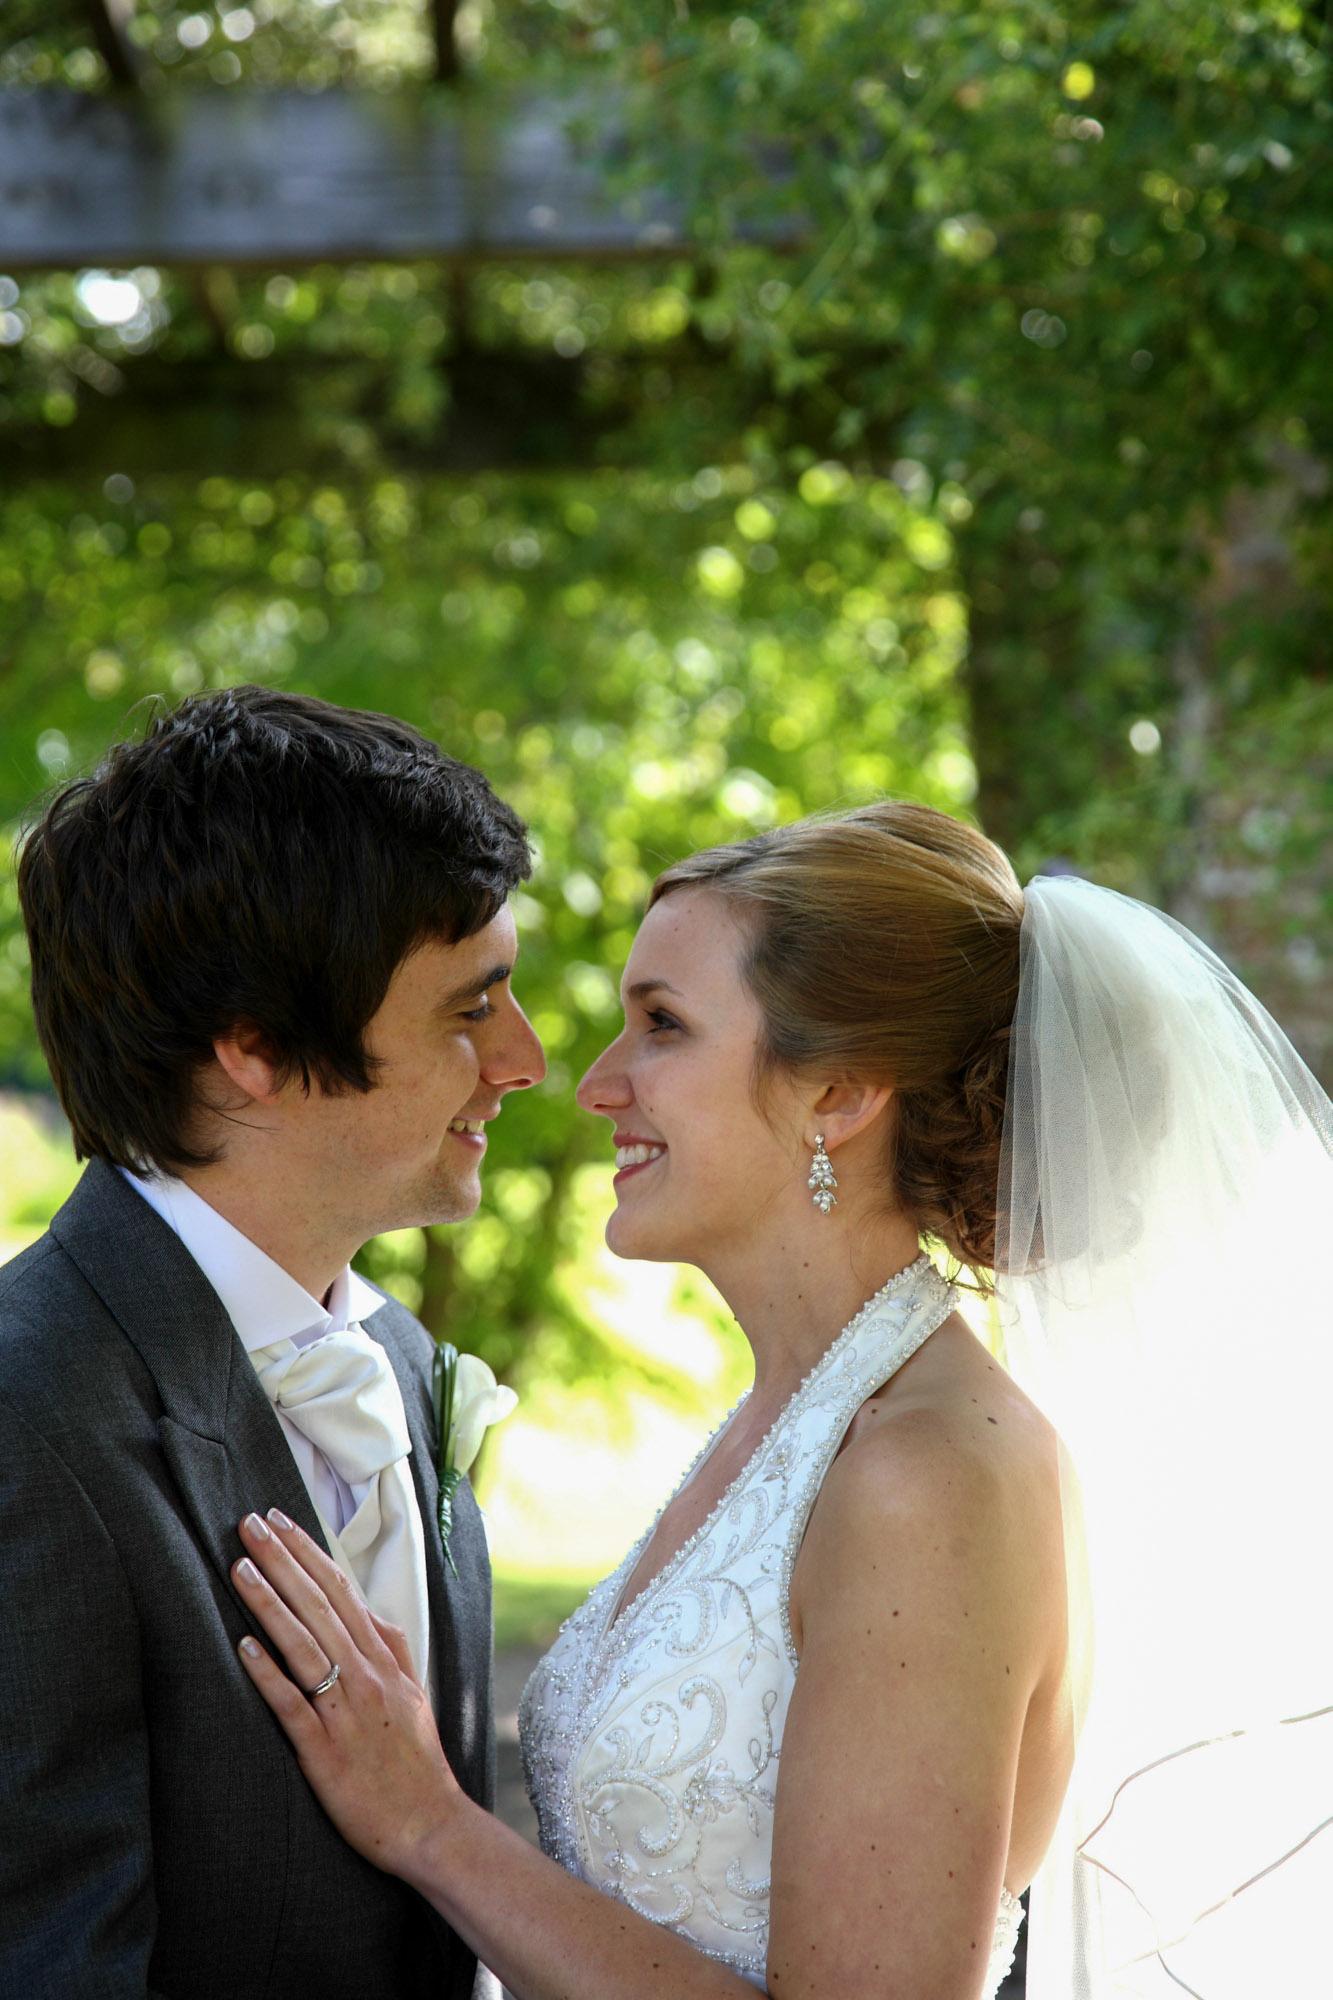 weddings-couples-love-photographer-oxford-london-jonathan-self-photography-86.jpg